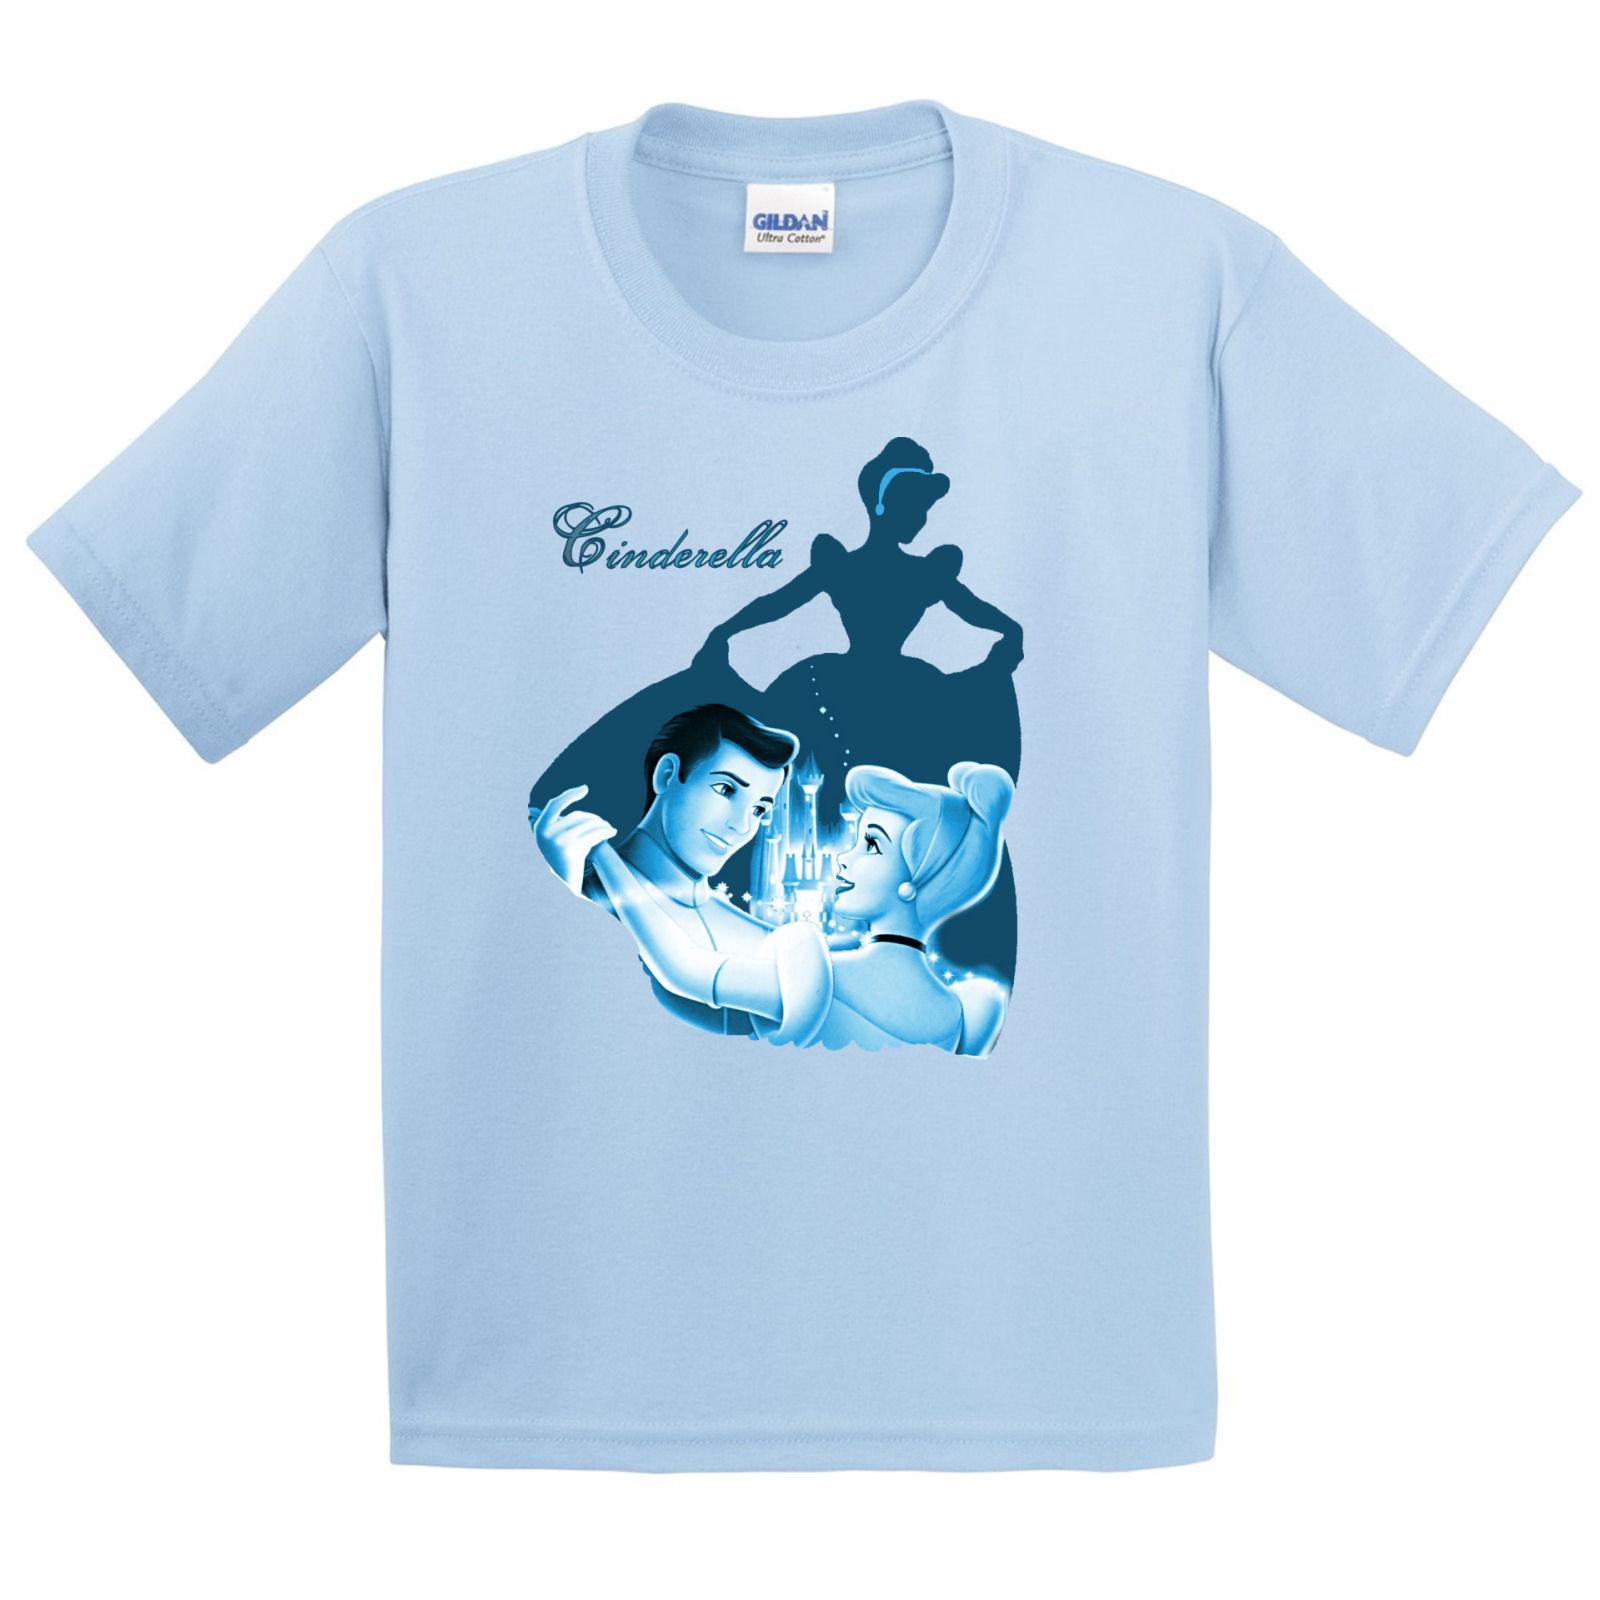 Cinderella Silhouette Girl 39 S Kids T Shirt My Heart Has